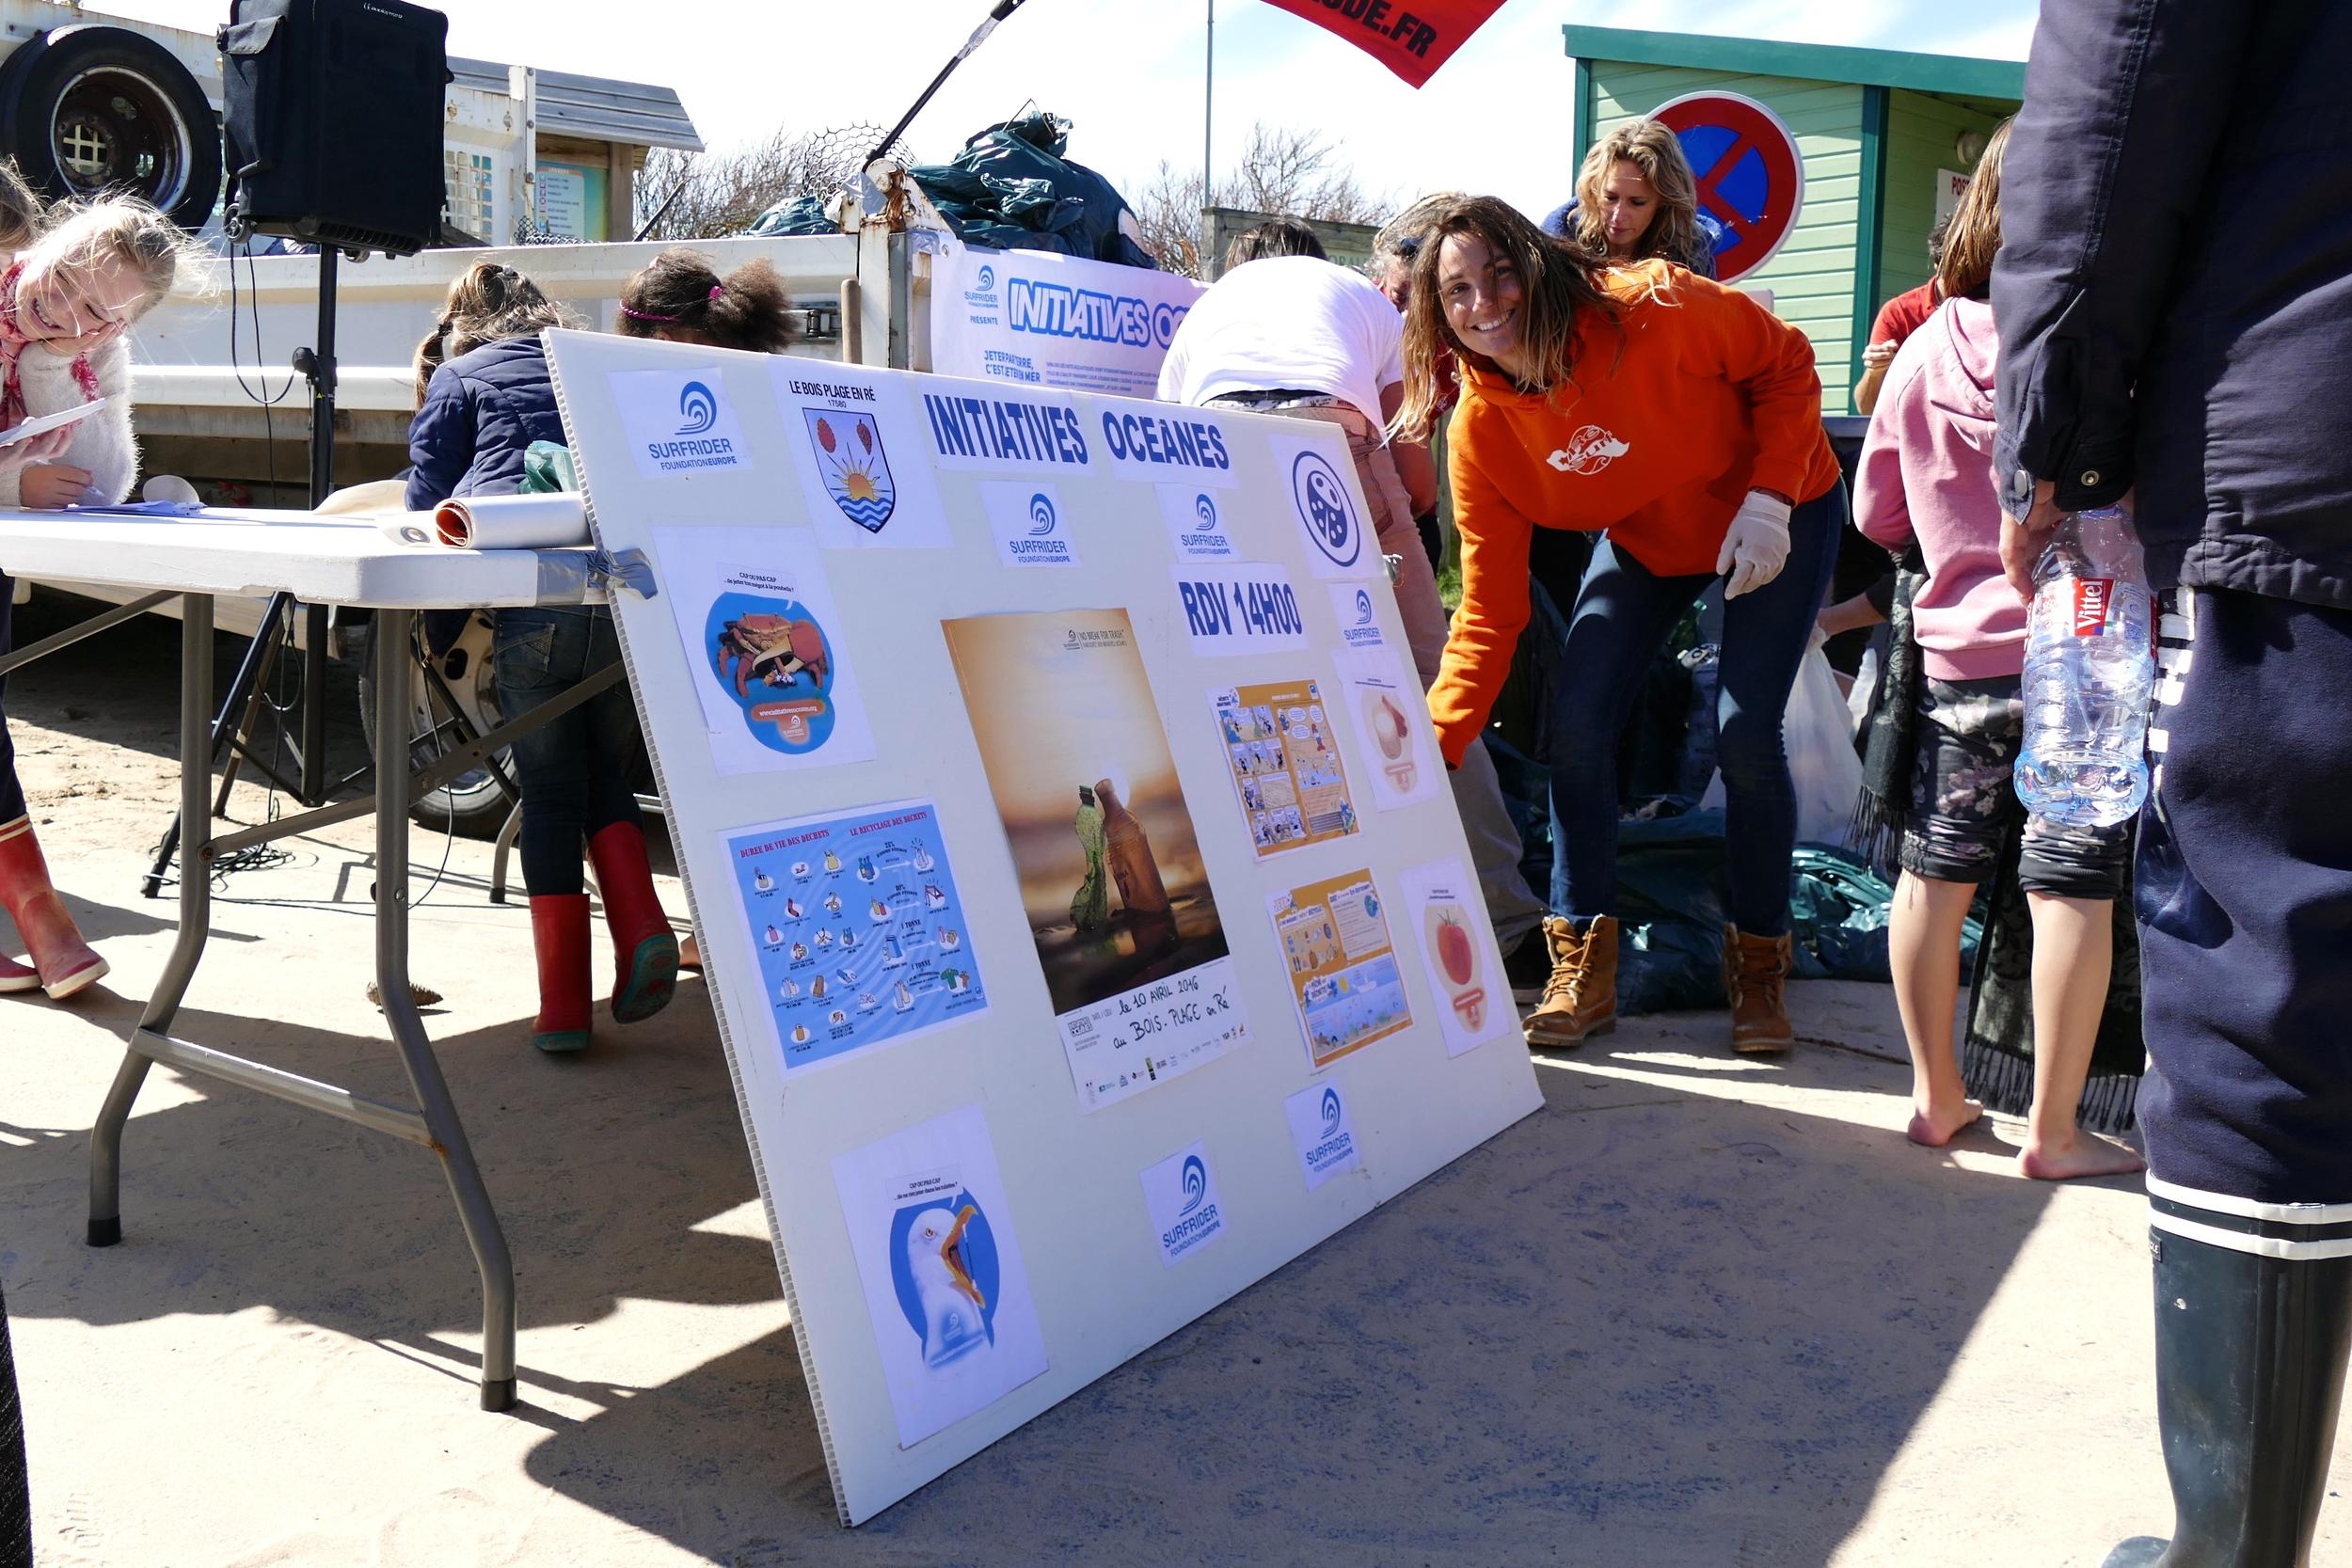 Les Initiatives Océanes de Surfriders Foundation